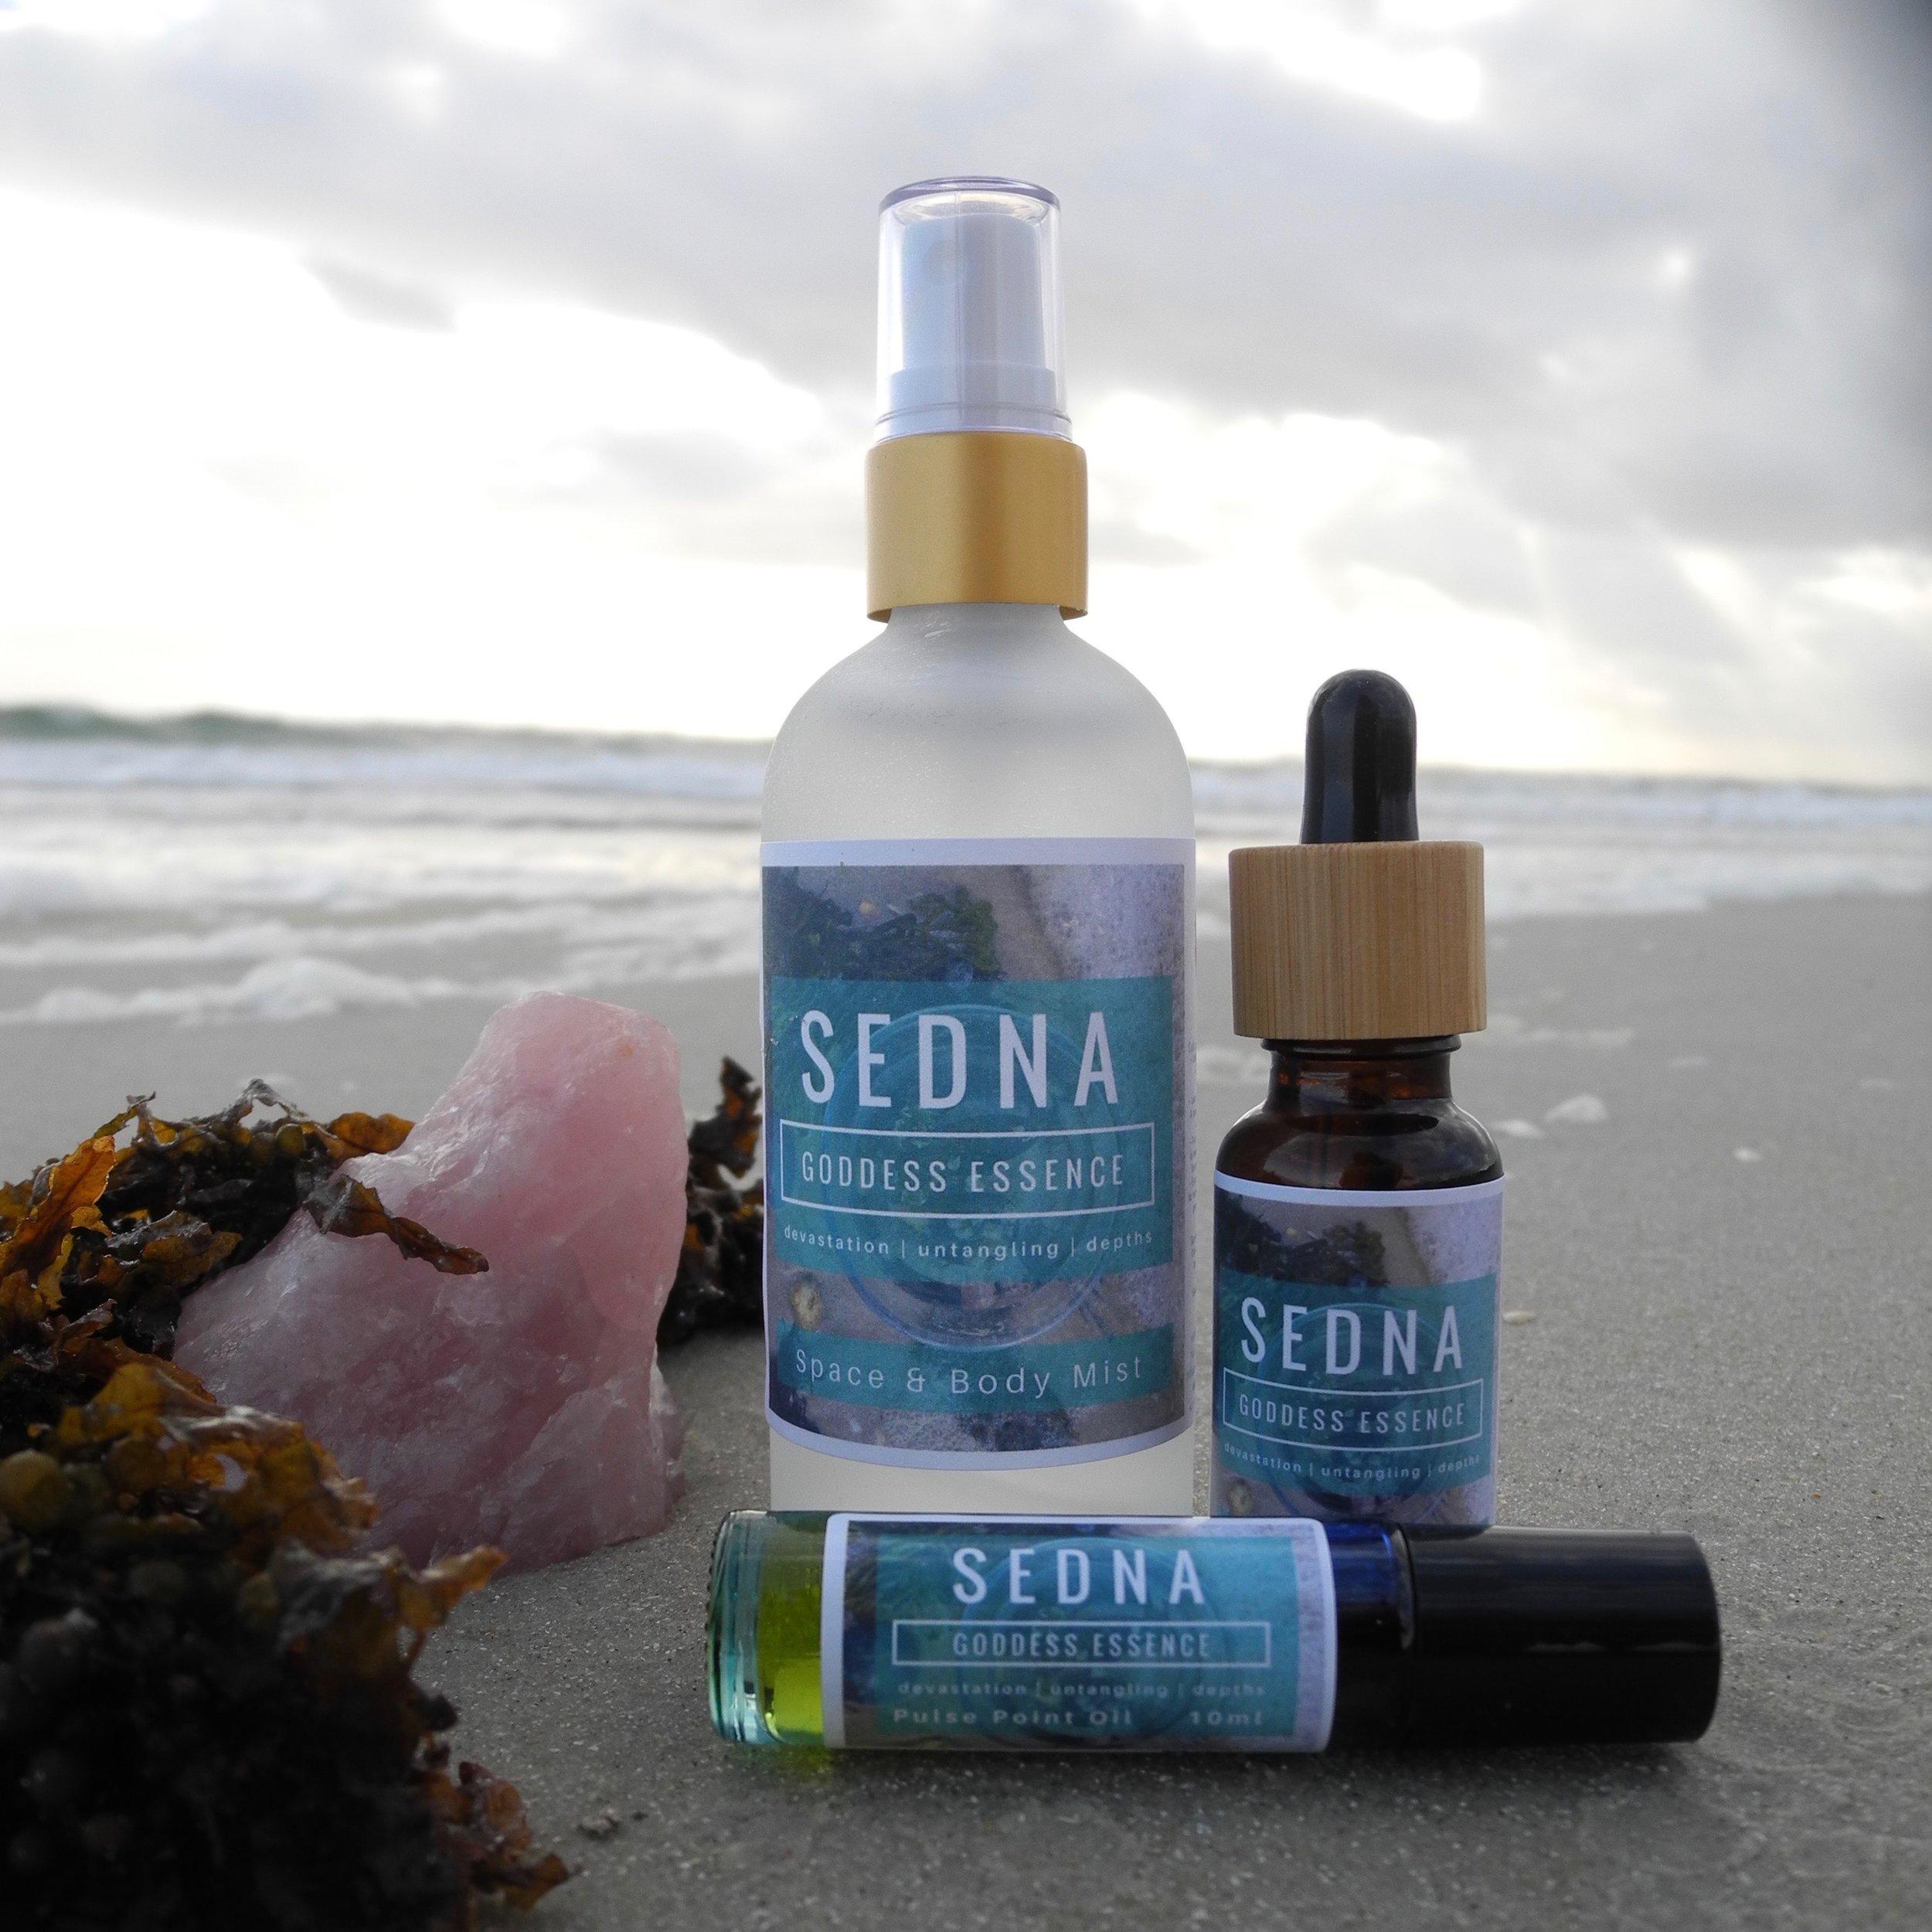 Buy Sedna Goddess Ritual Essence | Remedy Botanica